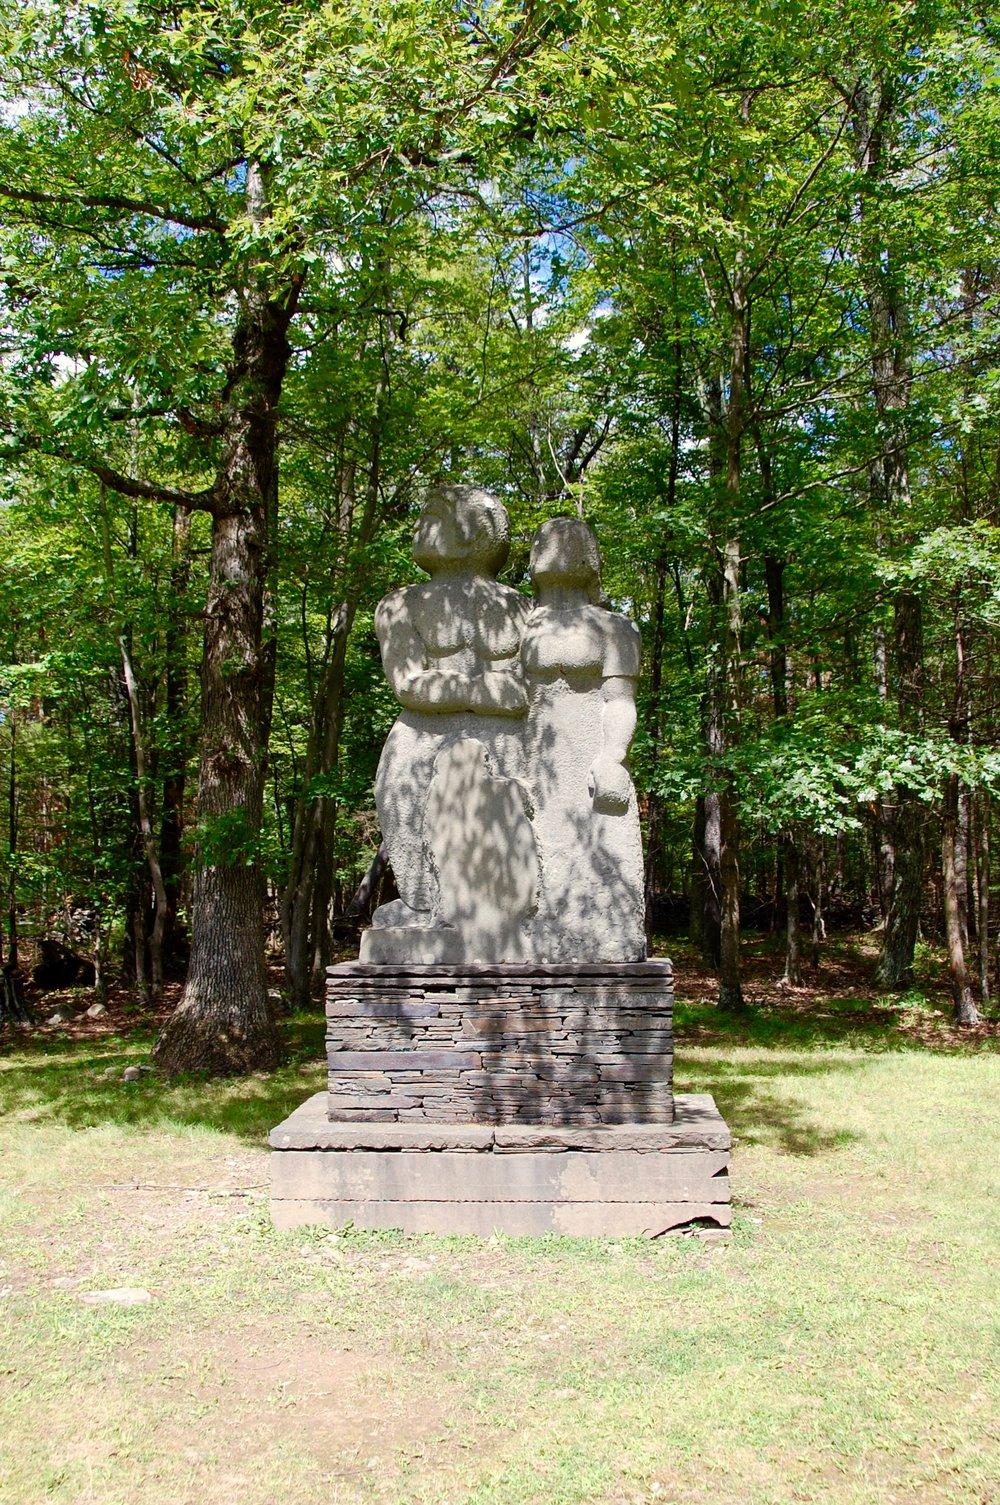 opus 40 couple statue